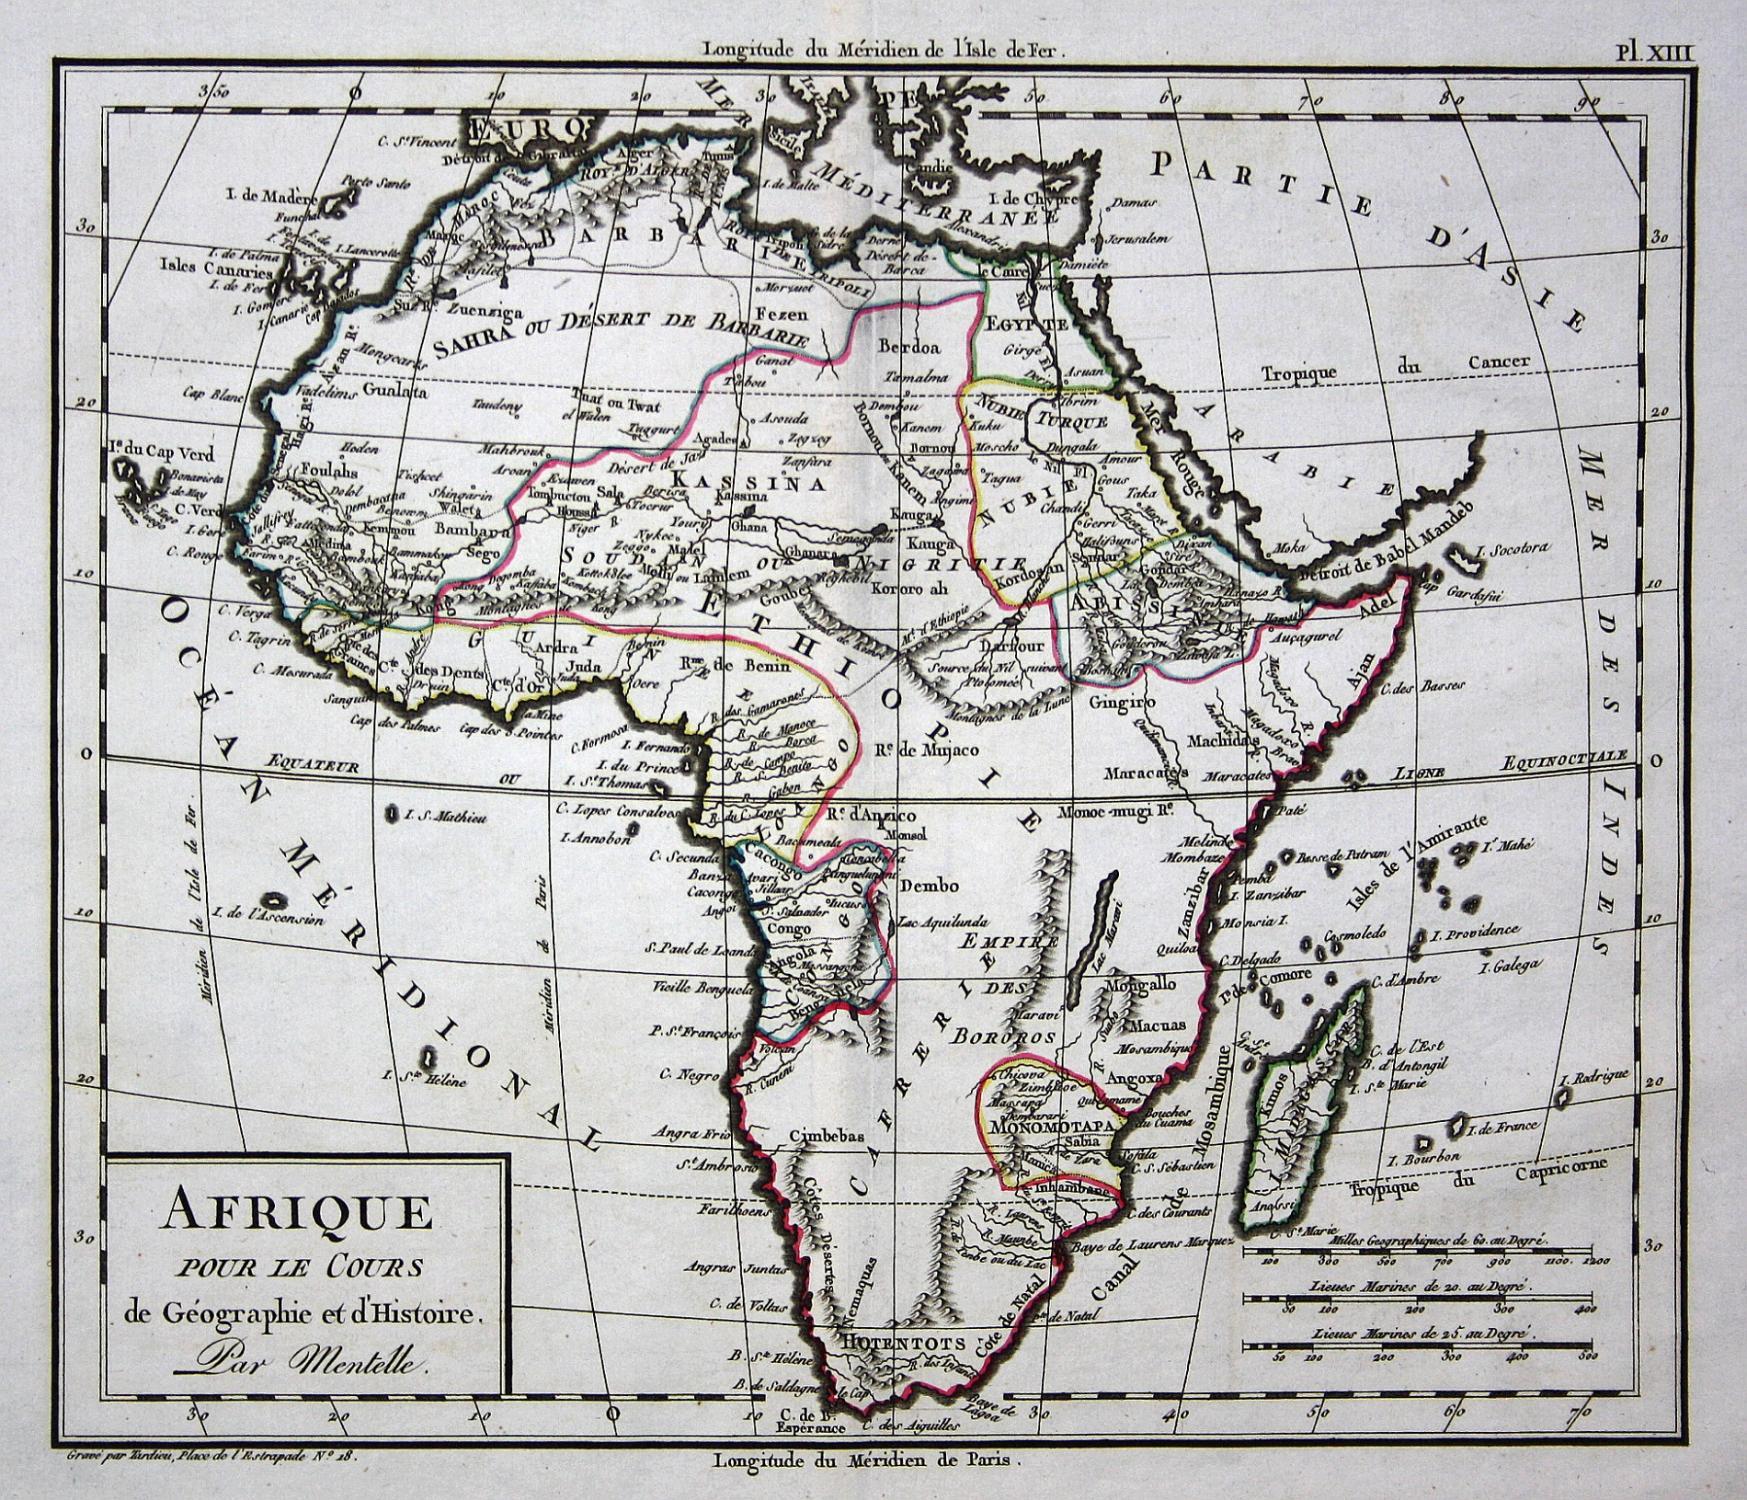 Madagaskar Karte.Afrique